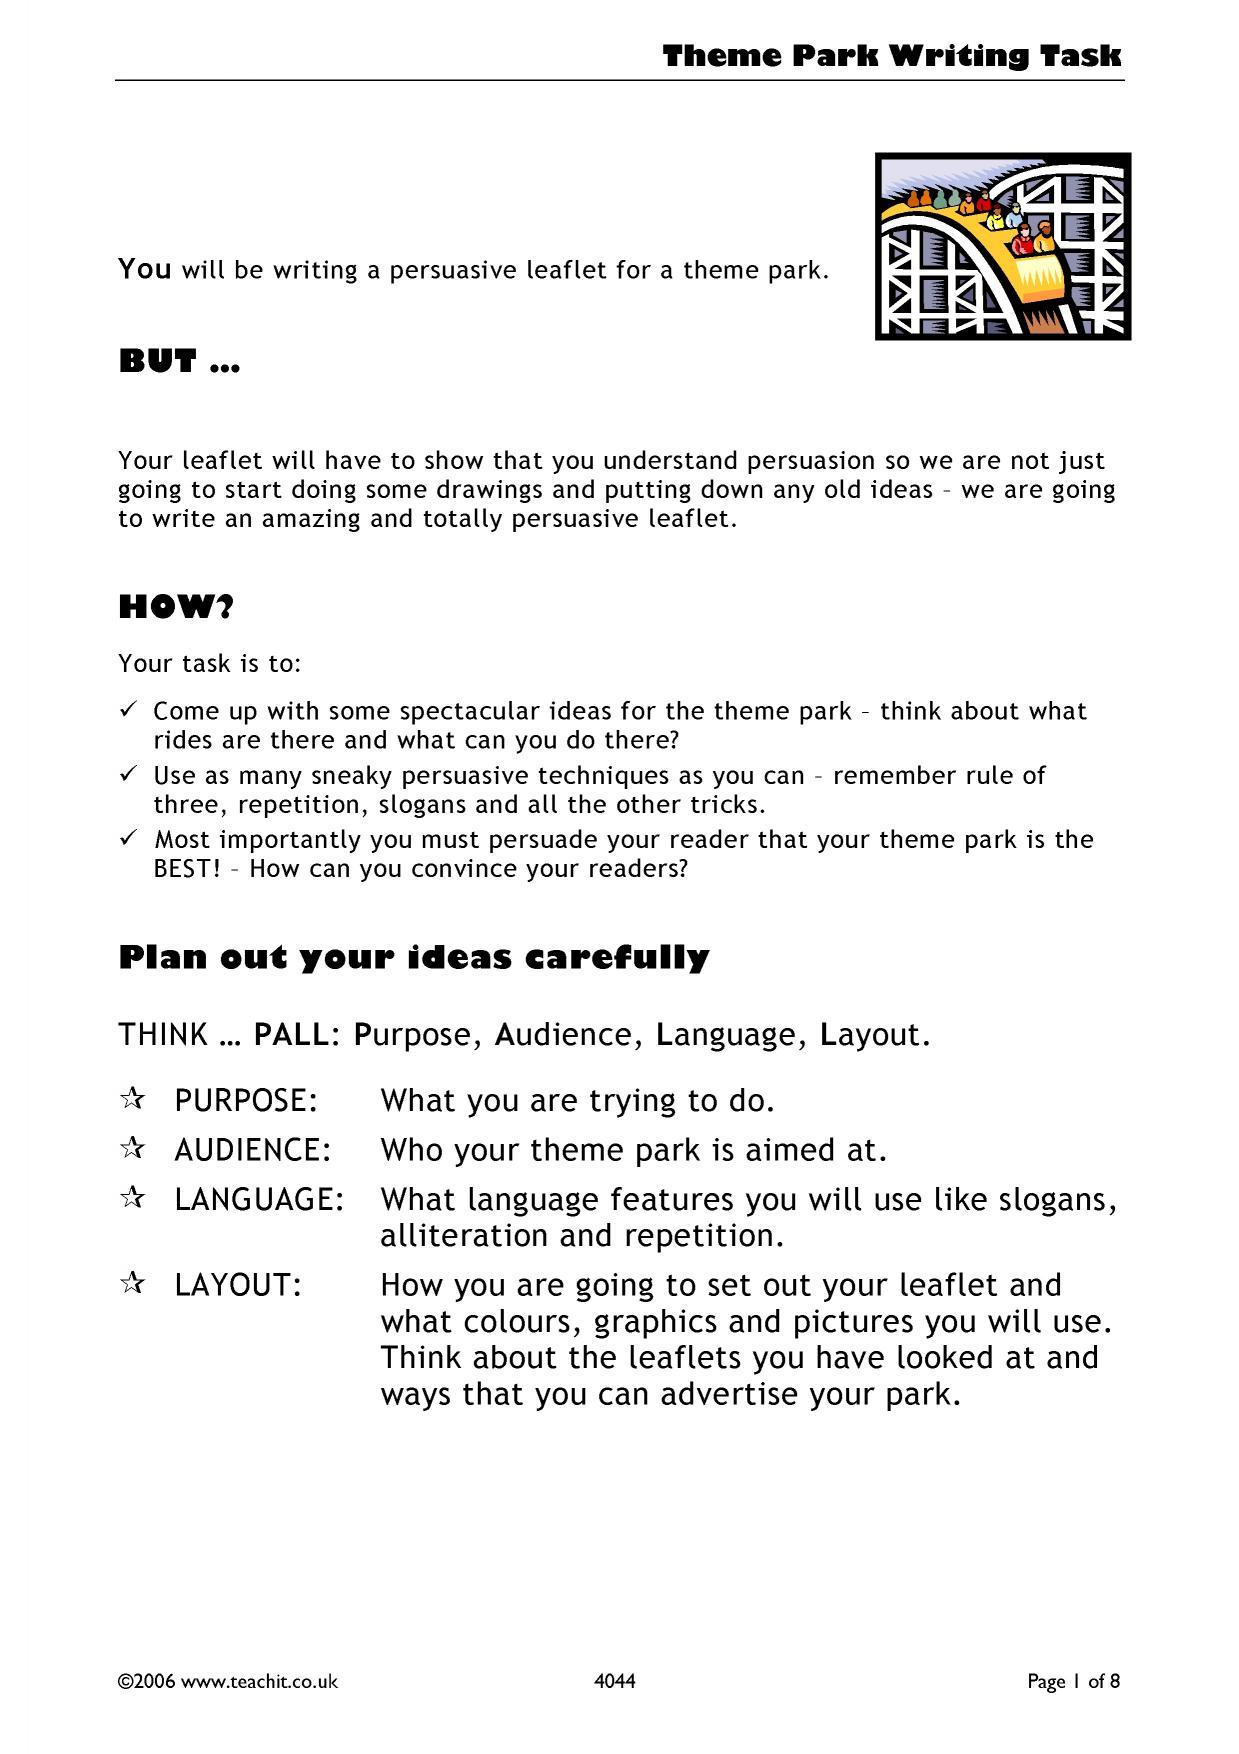 features of persuasive writing Persuasive writing features (matthew fagg) writing to persuade  features of a persuasive leaflet (lindsey franklin) persuasive writing mat (rhian walton) doc.